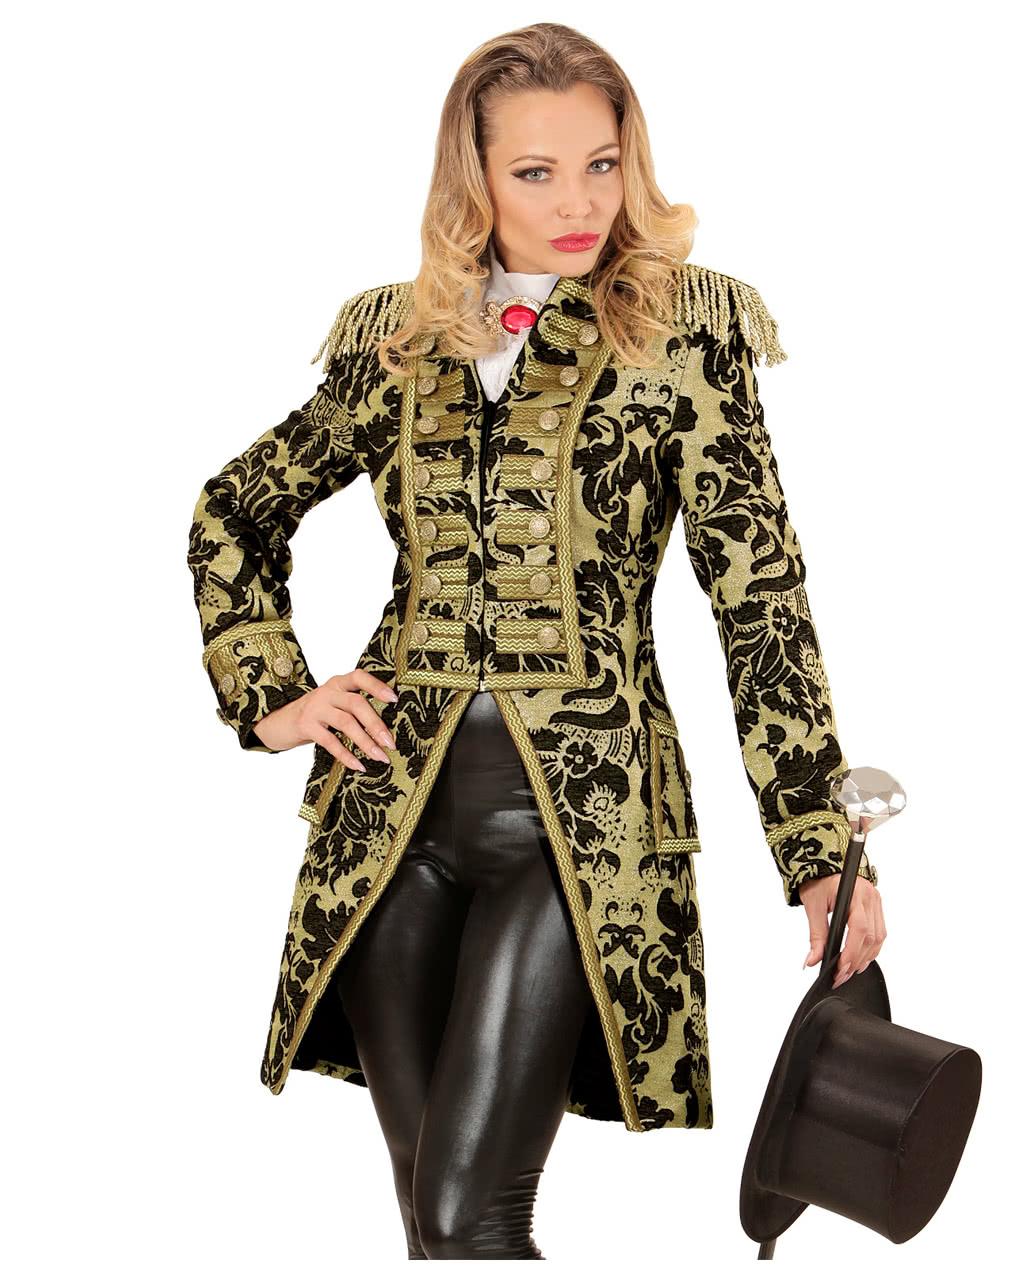 Venetian Ladies Dress Suit Gold Black To Buy Horror Shop Com